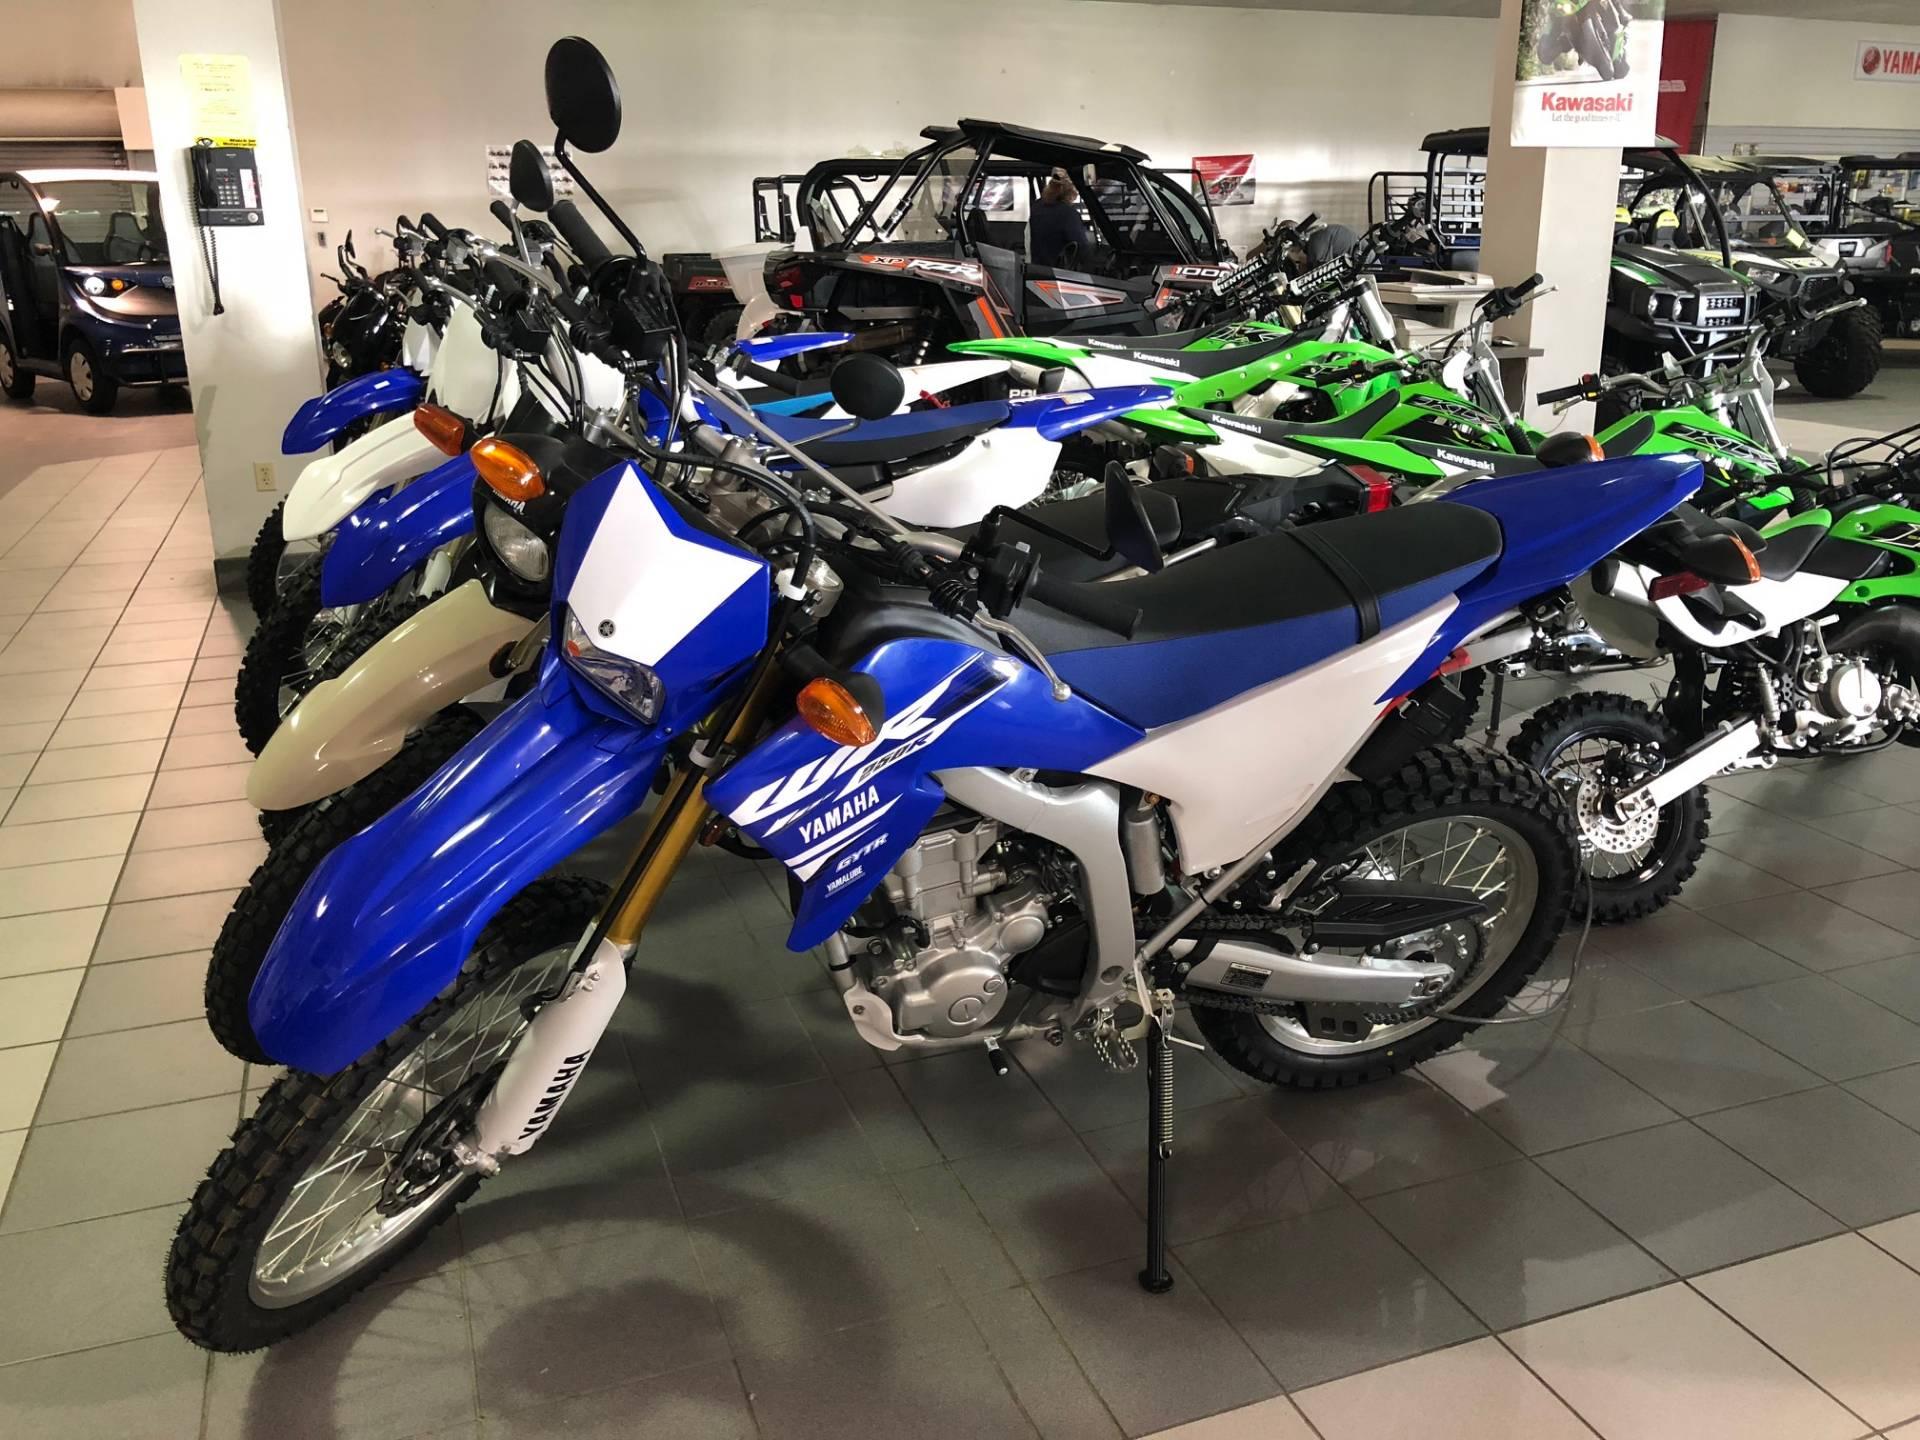 2018 Yamaha WR250R for sale 10617